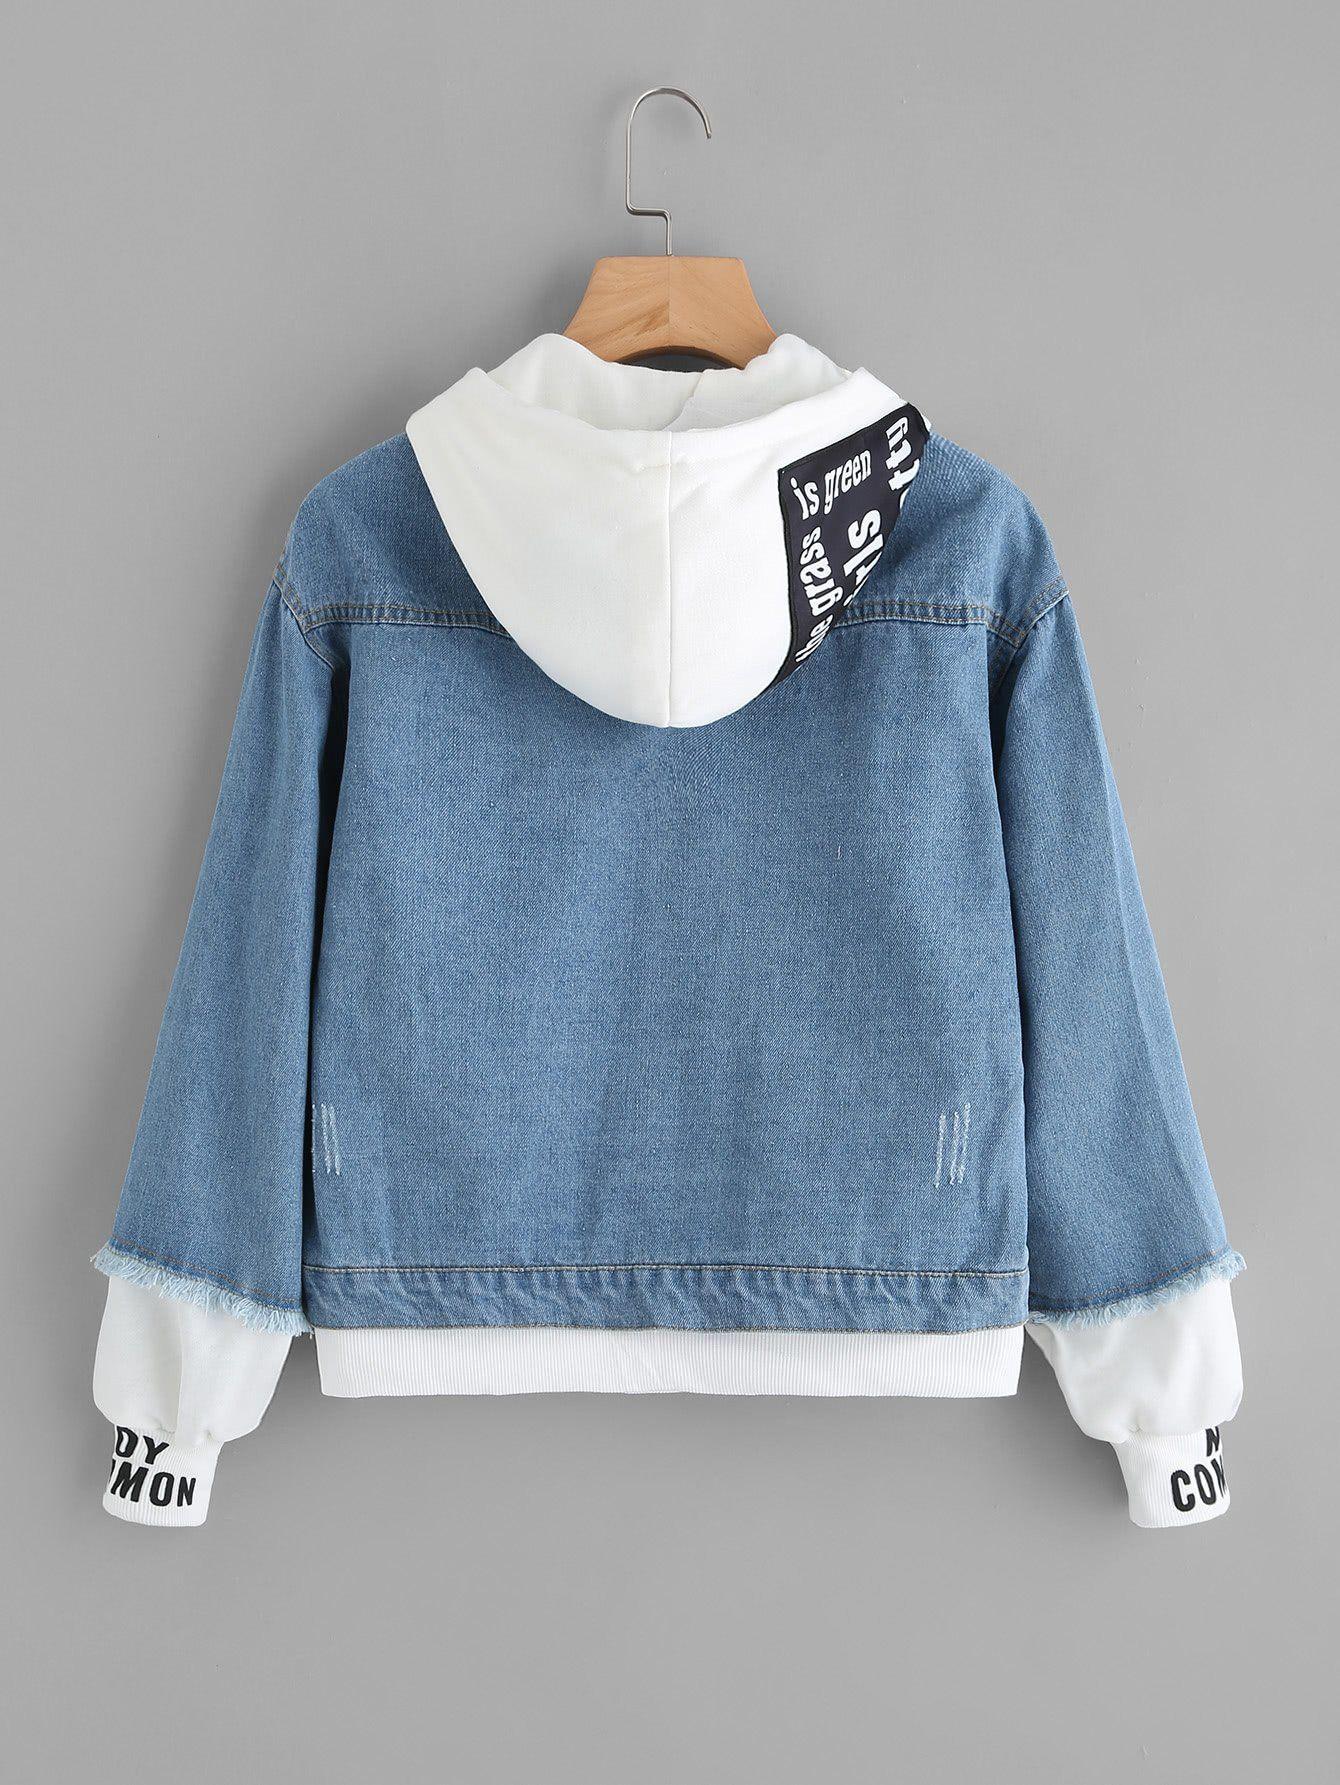 2 In 1 Ribbed Knit Trim Hooded Denim Jacket In 2020 Diy Denim Jacket Hooded Denim Jacket Blue Jackets Outfits [ 1785 x 1340 Pixel ]